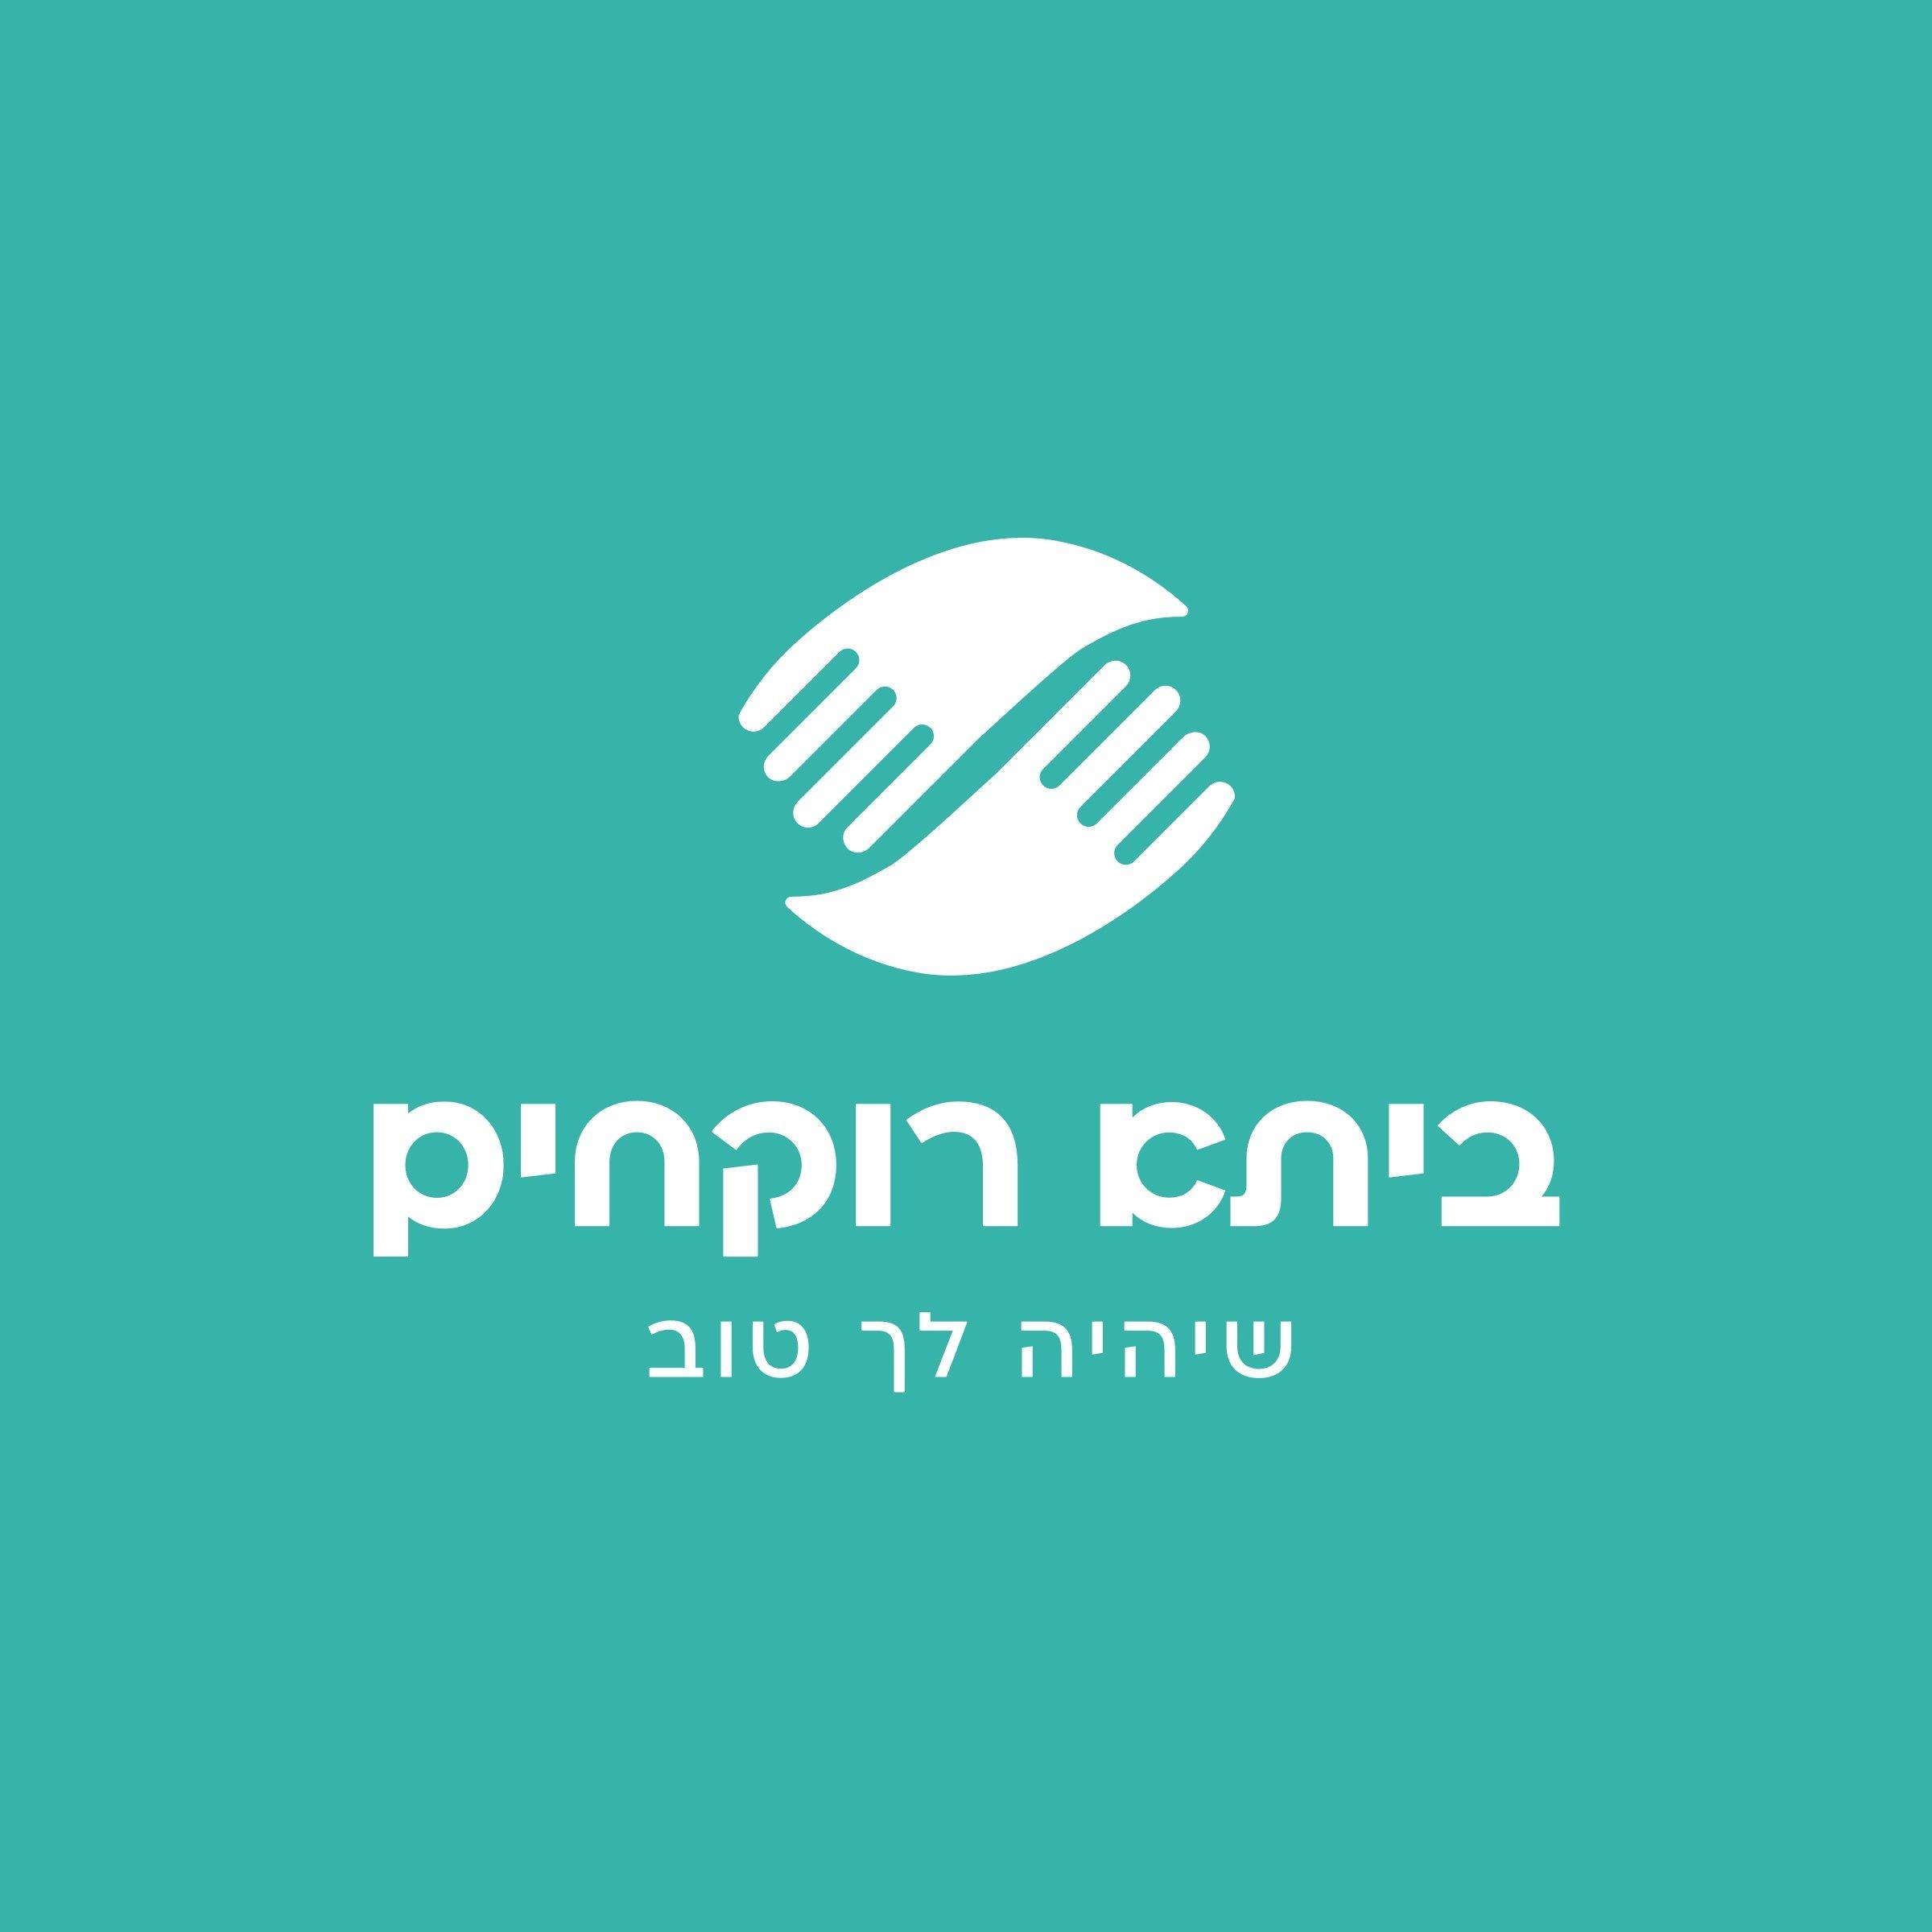 Betarokhim branding by hello.